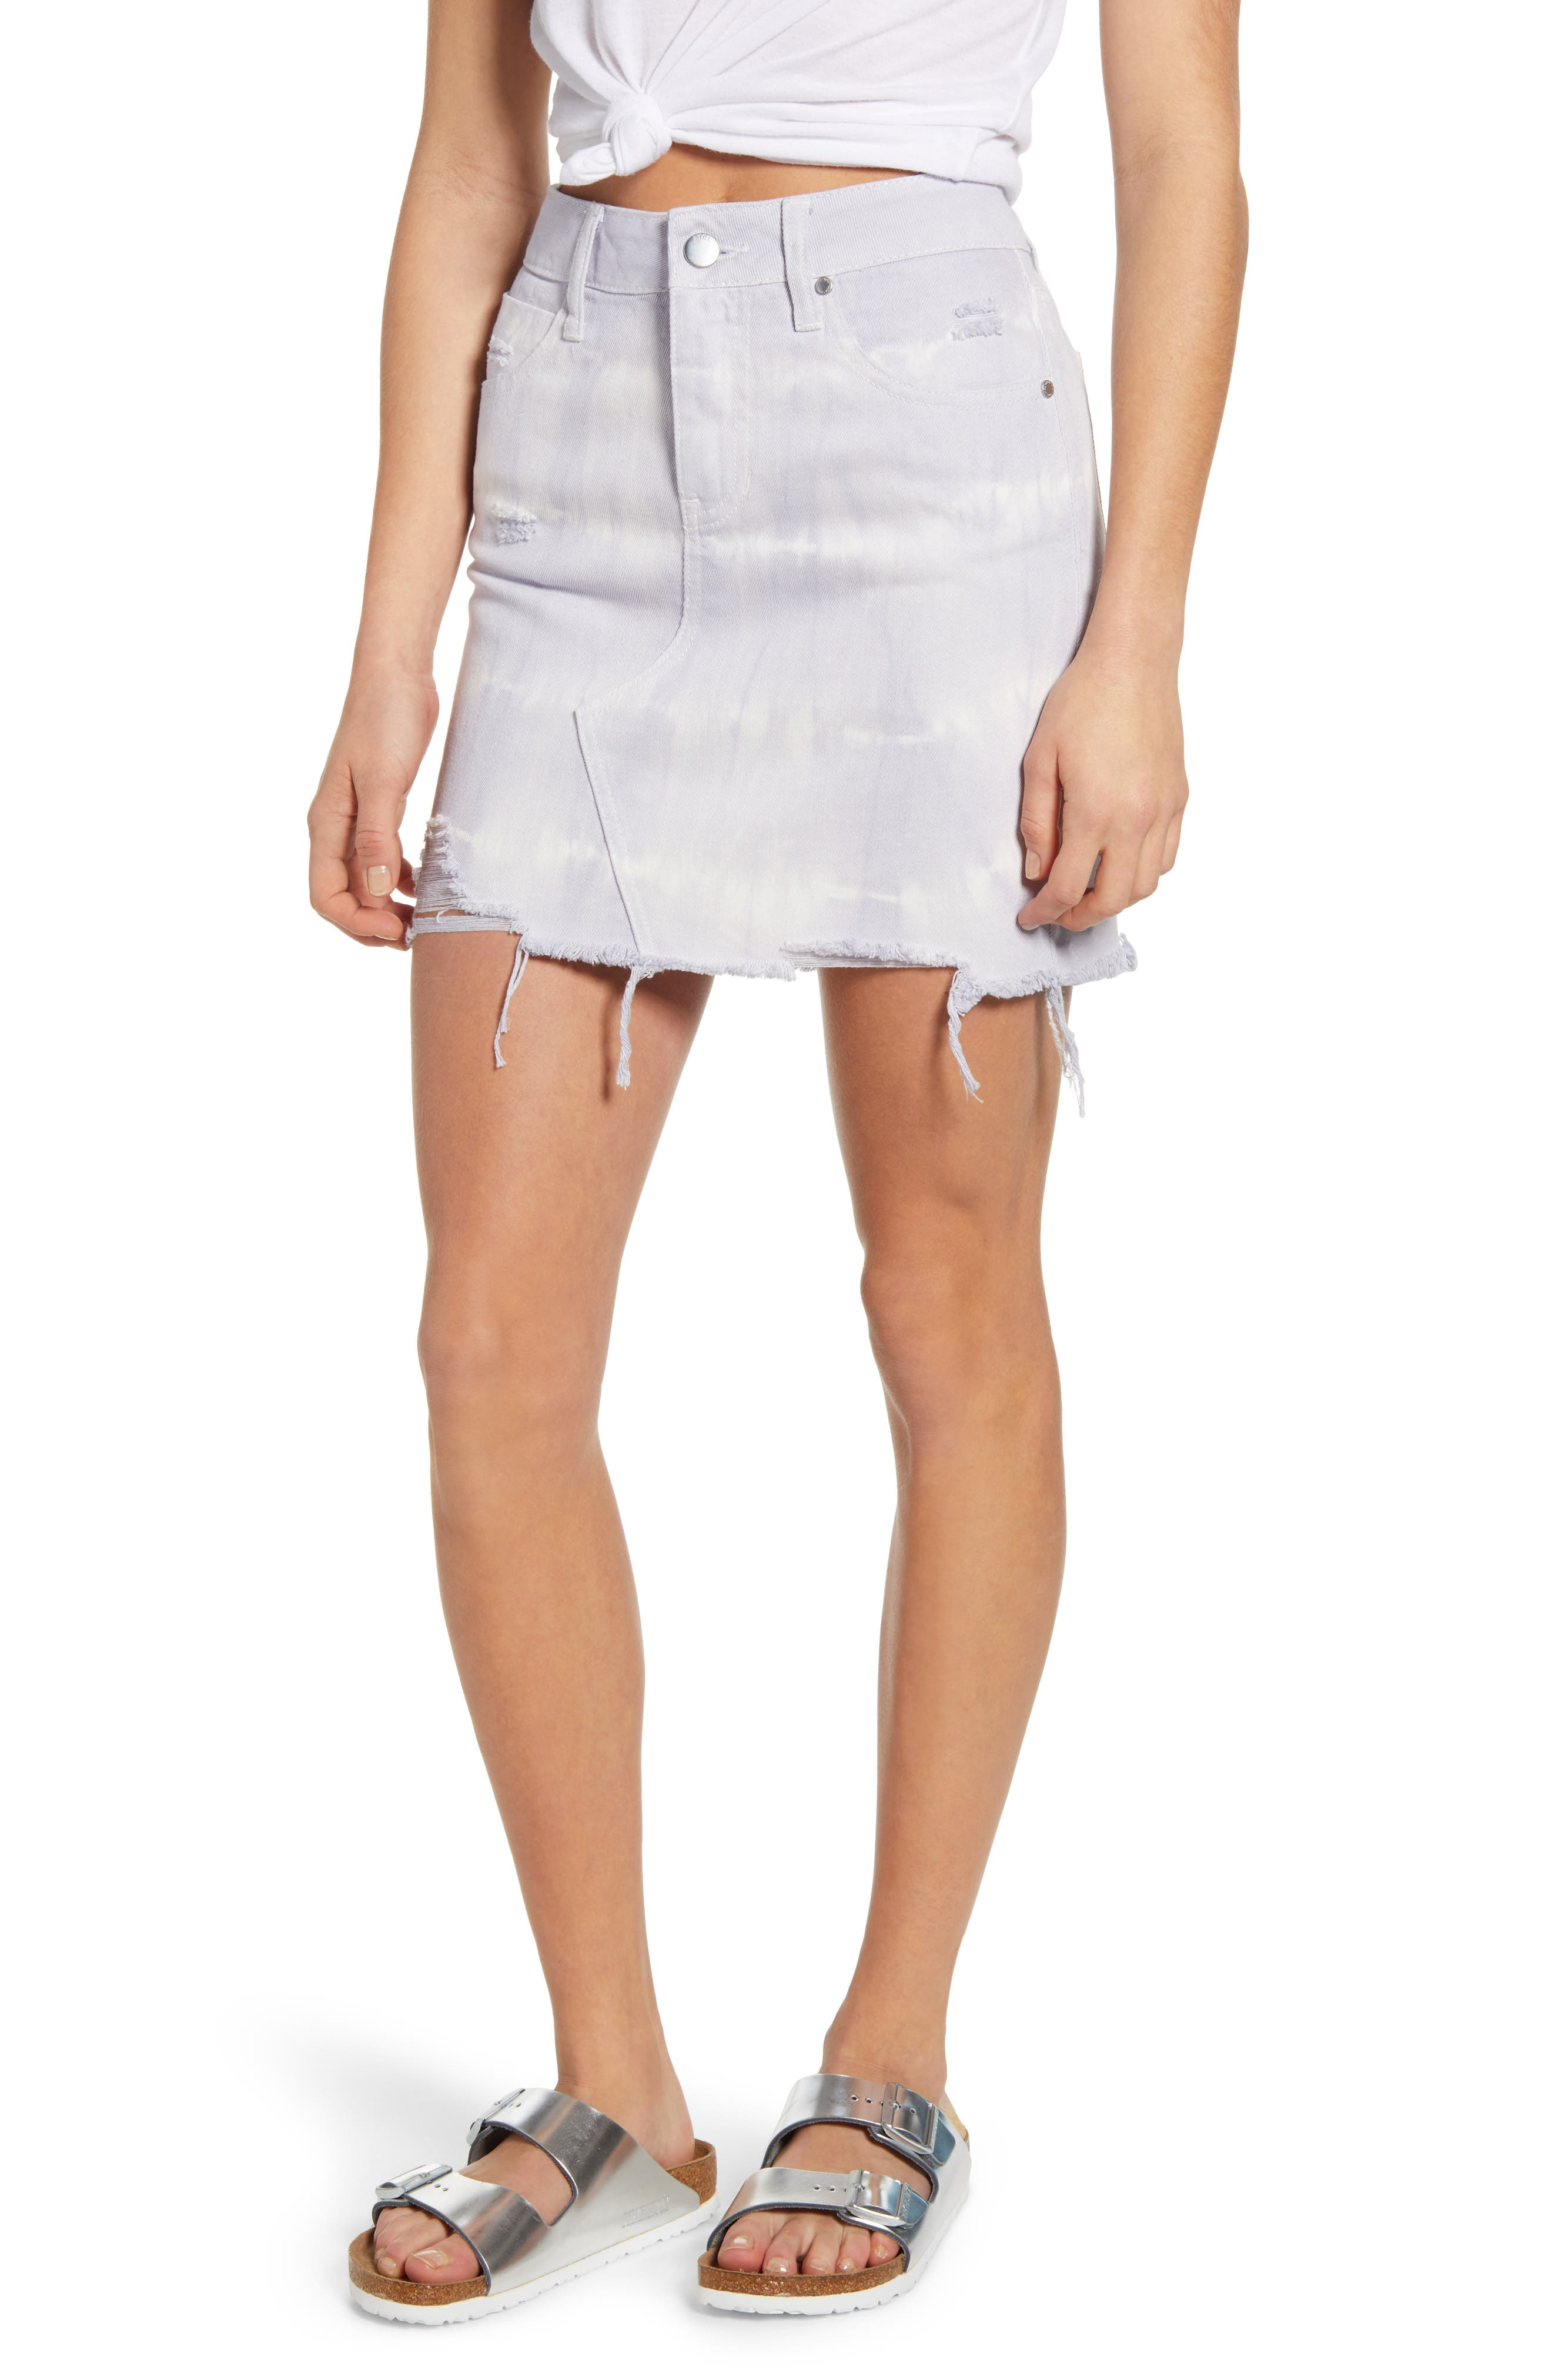 PTCL Tie Dye Distressed Raw Hem Denim Miniskirt | Nordstrom